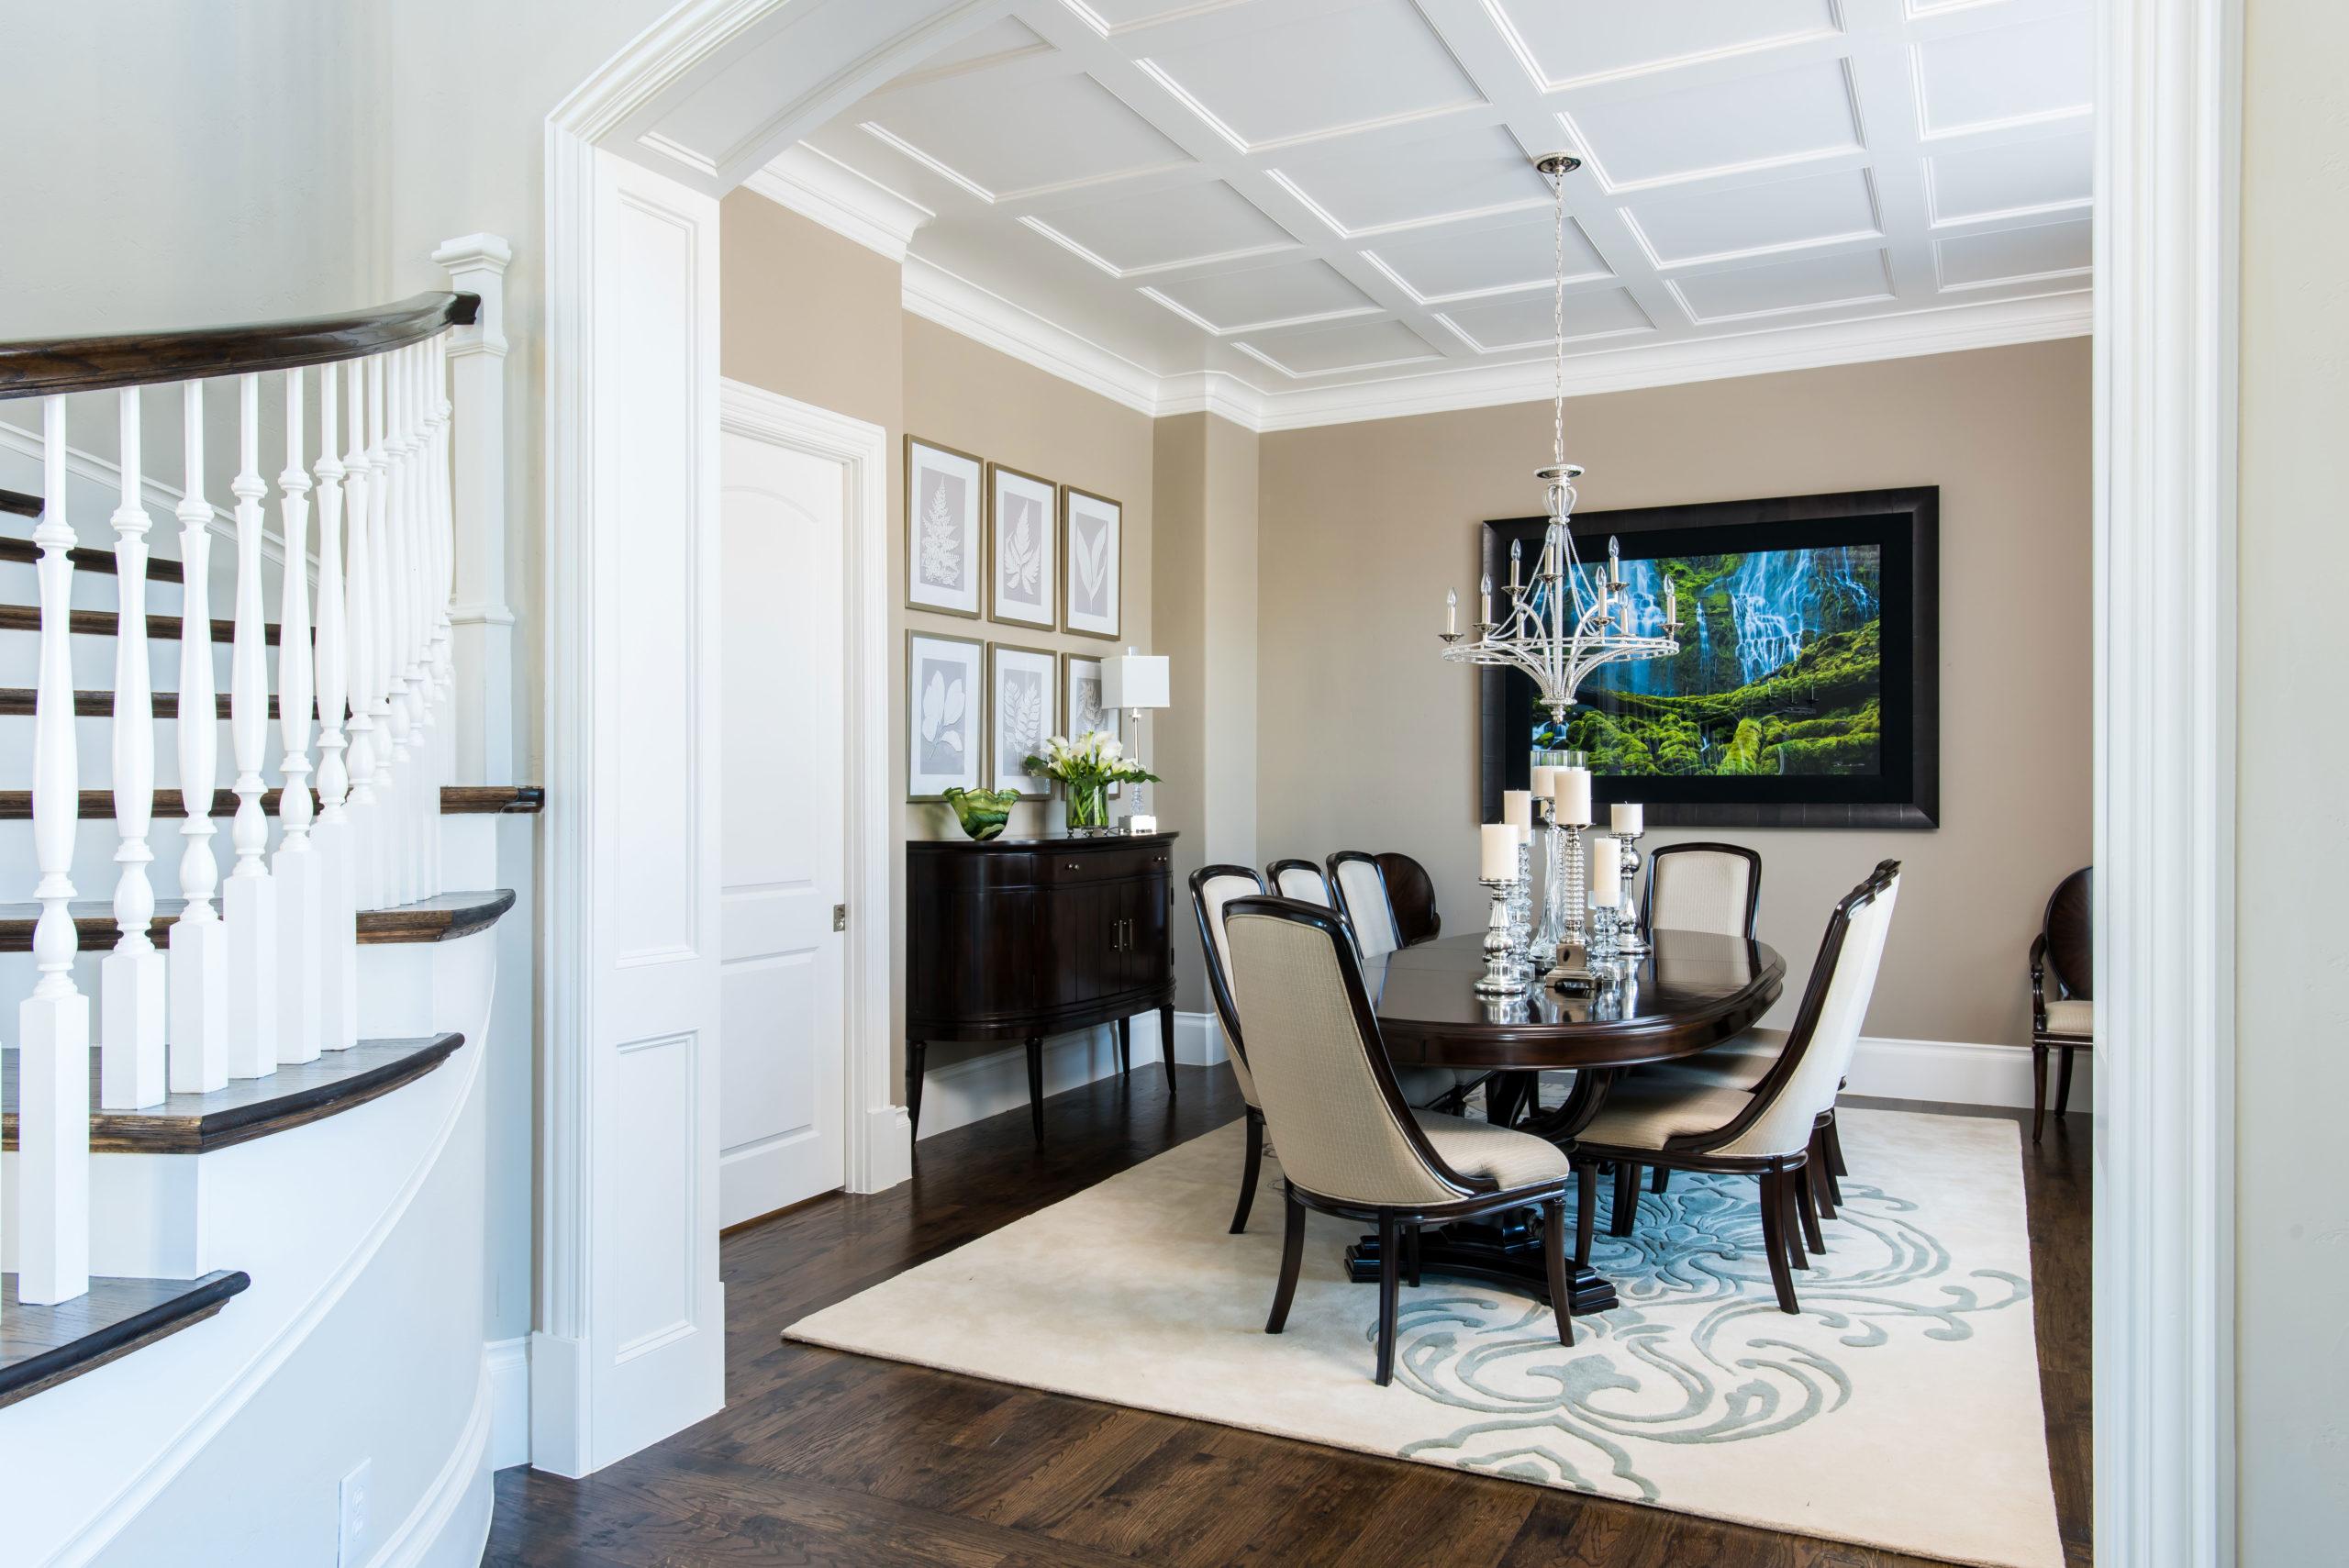 Calm Serenity 4 - Dallas Interior Designer serving Plano, Frisco, Dallas, Allen for Decorating Den Interiors D'KOR HOME by Dee Frazier Interiors